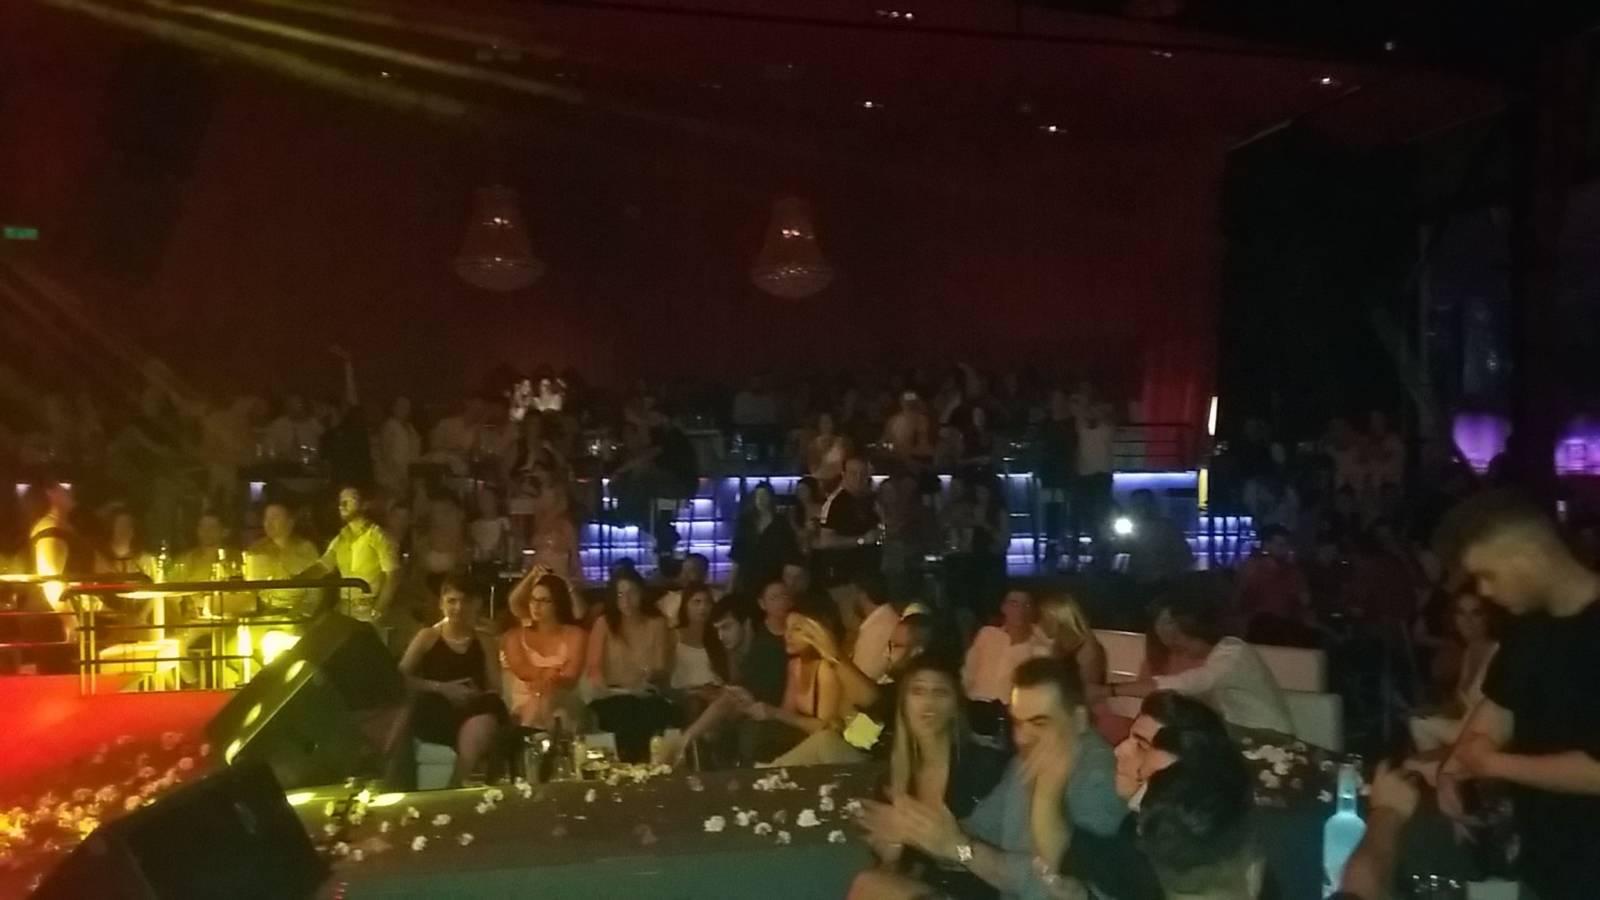 H διασκέδαση χτύπησε «κόκκινο» στο Xs live στην Πτολεμαΐδα, με την εμφάνιση του Πάνου Κιάμου, το βράδυ του Σαββάτου 22 Ιουλίου